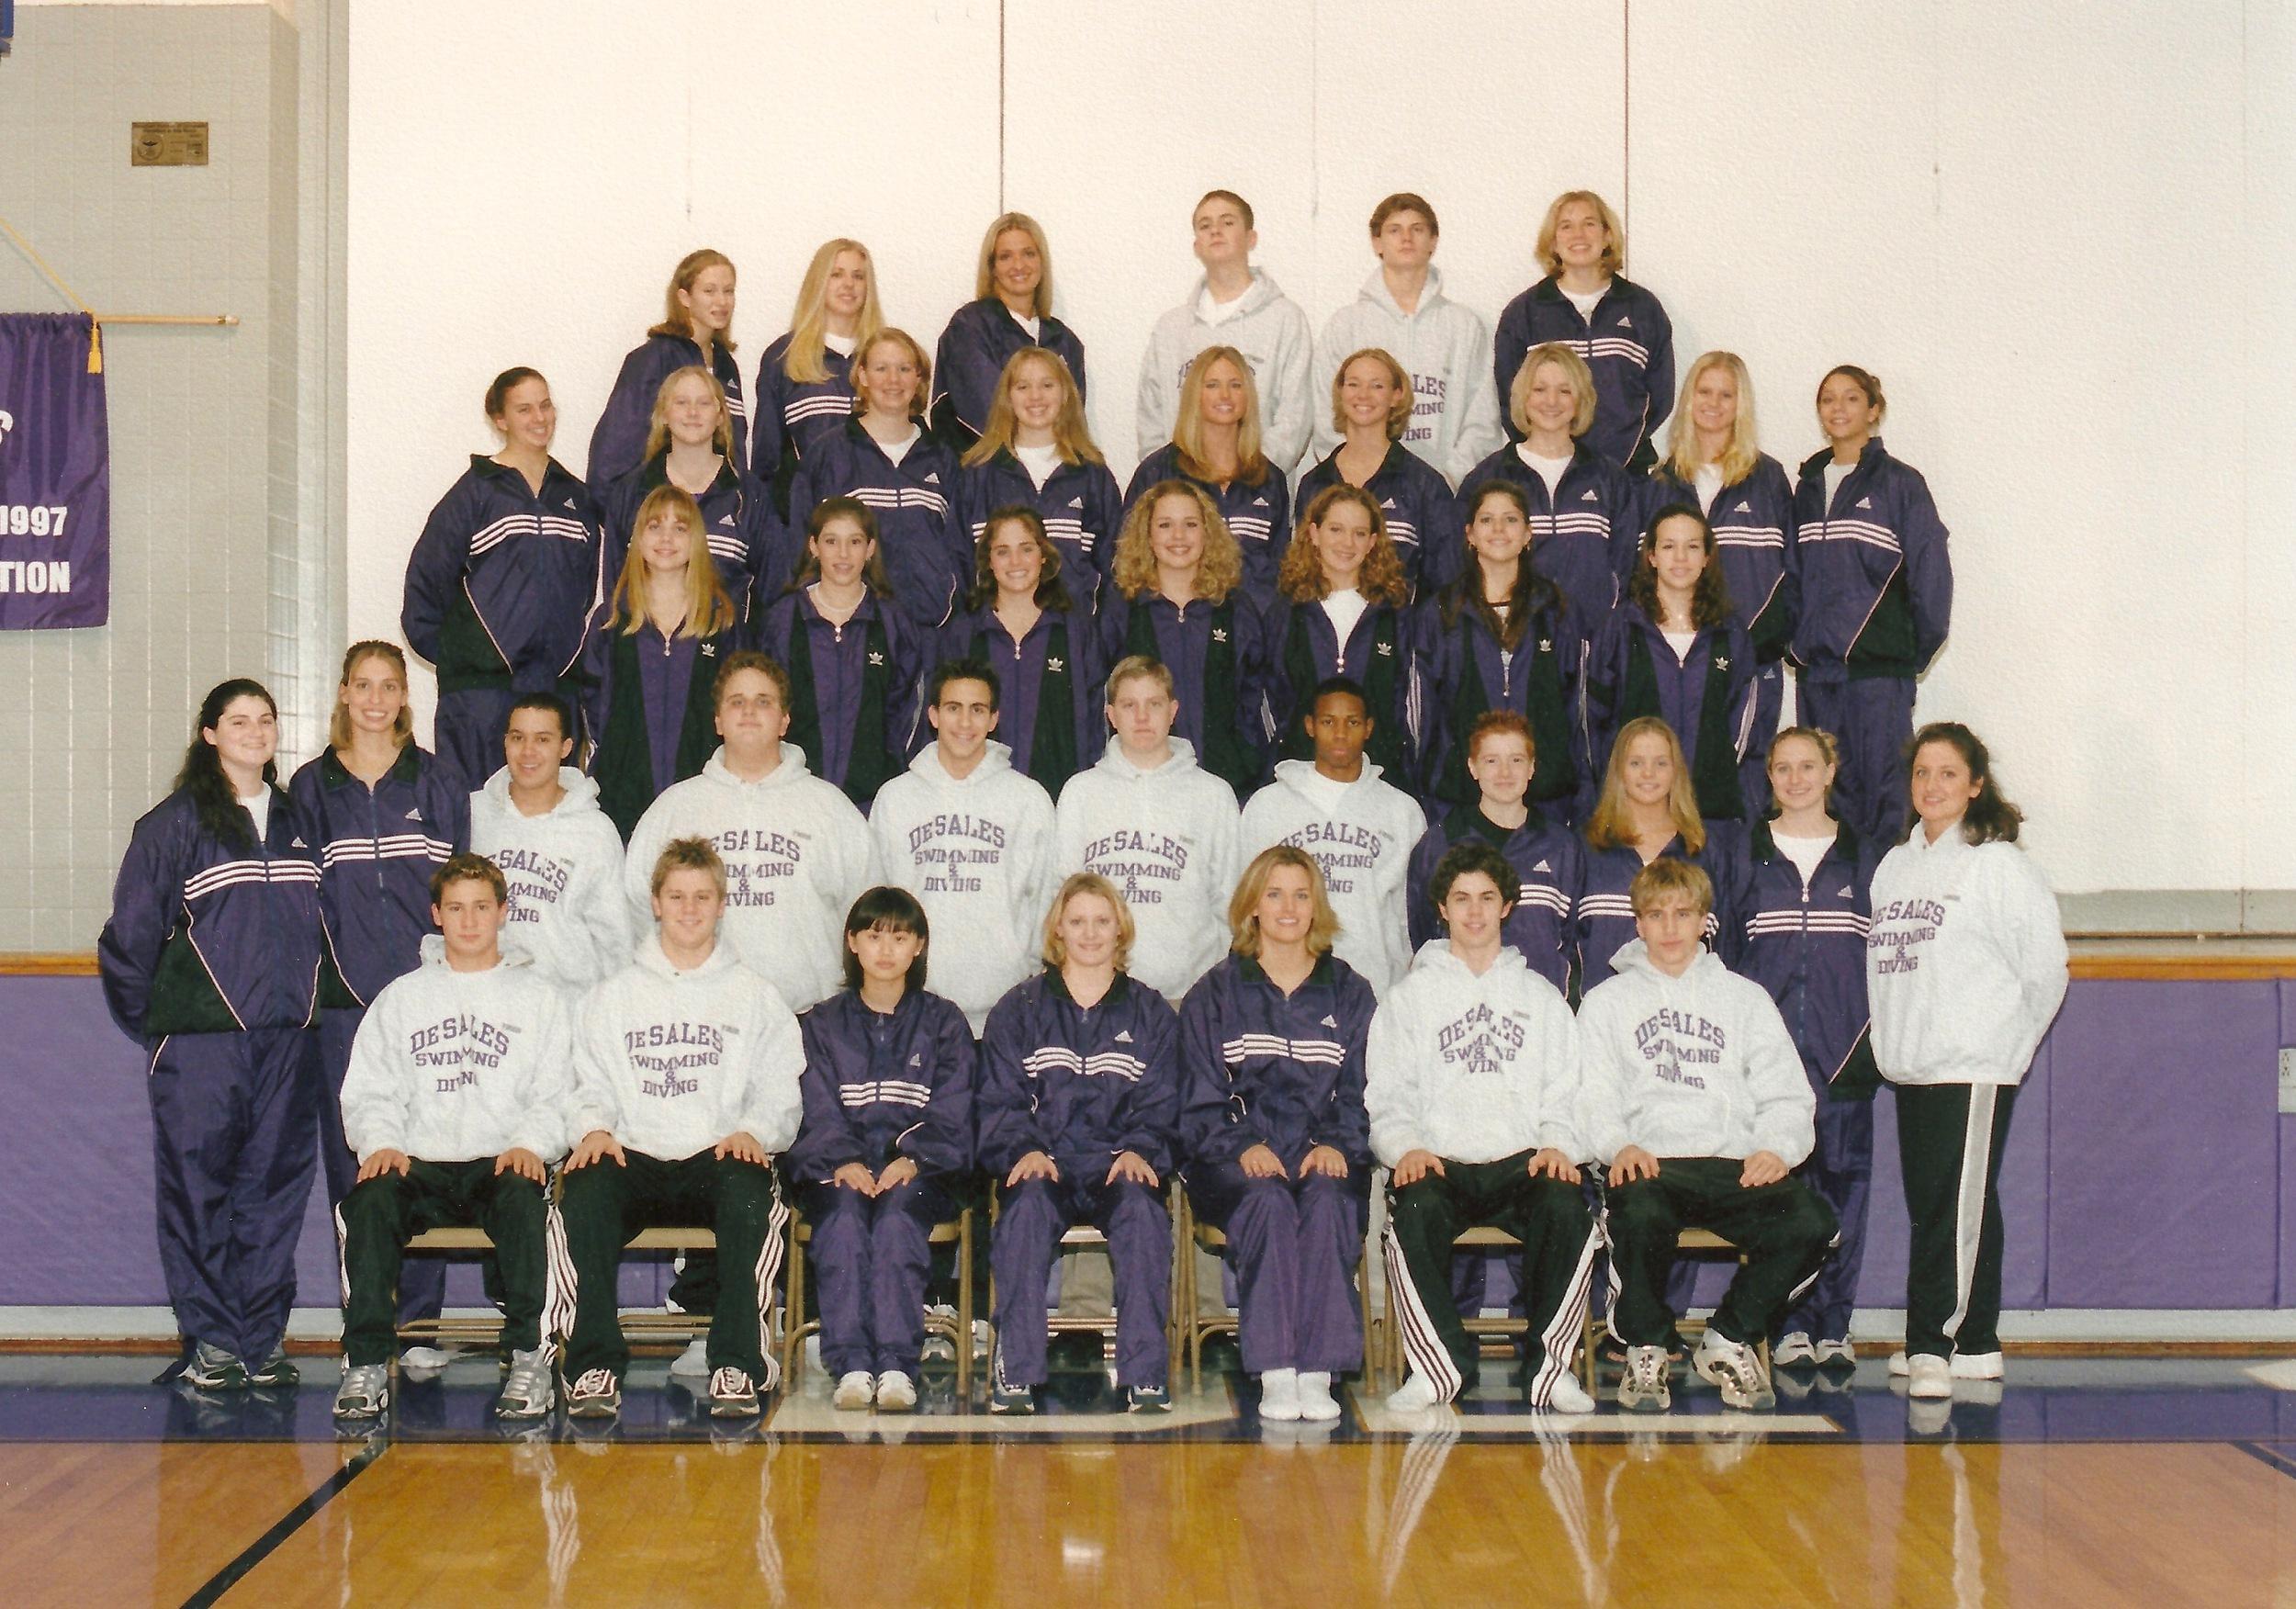 2001 CCL Champion